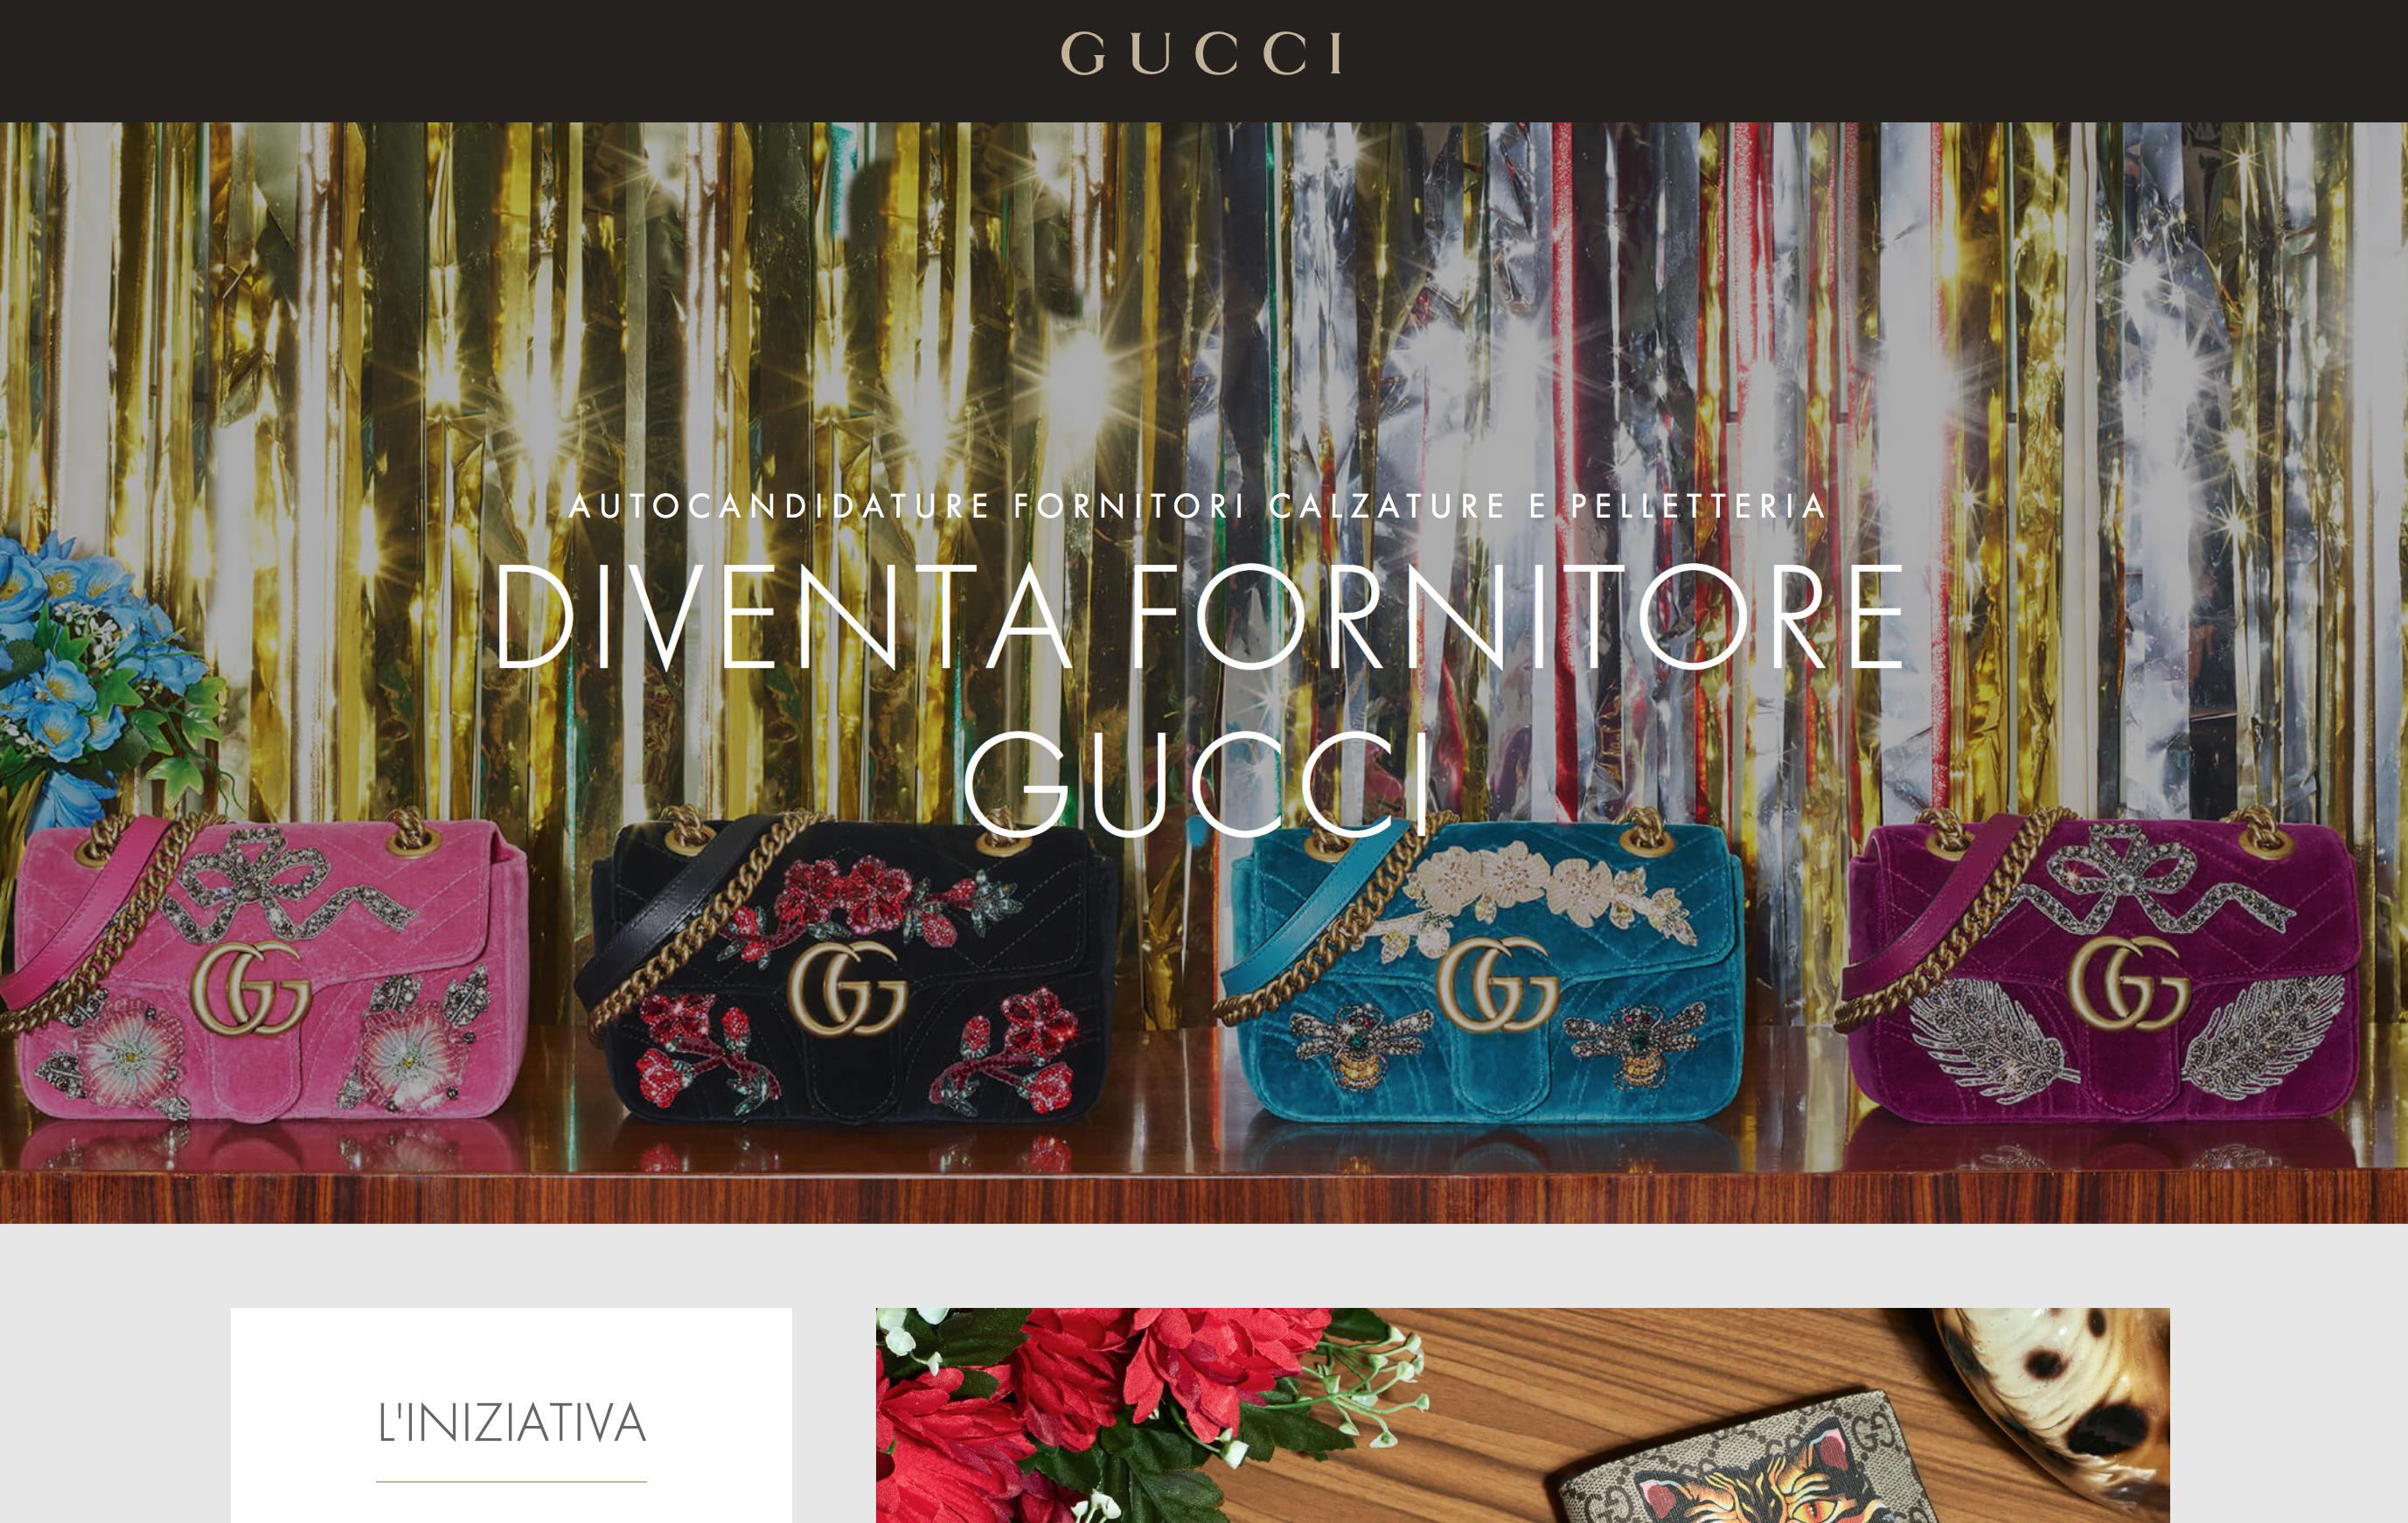 The Italian luxury good brand goes big launching their new range